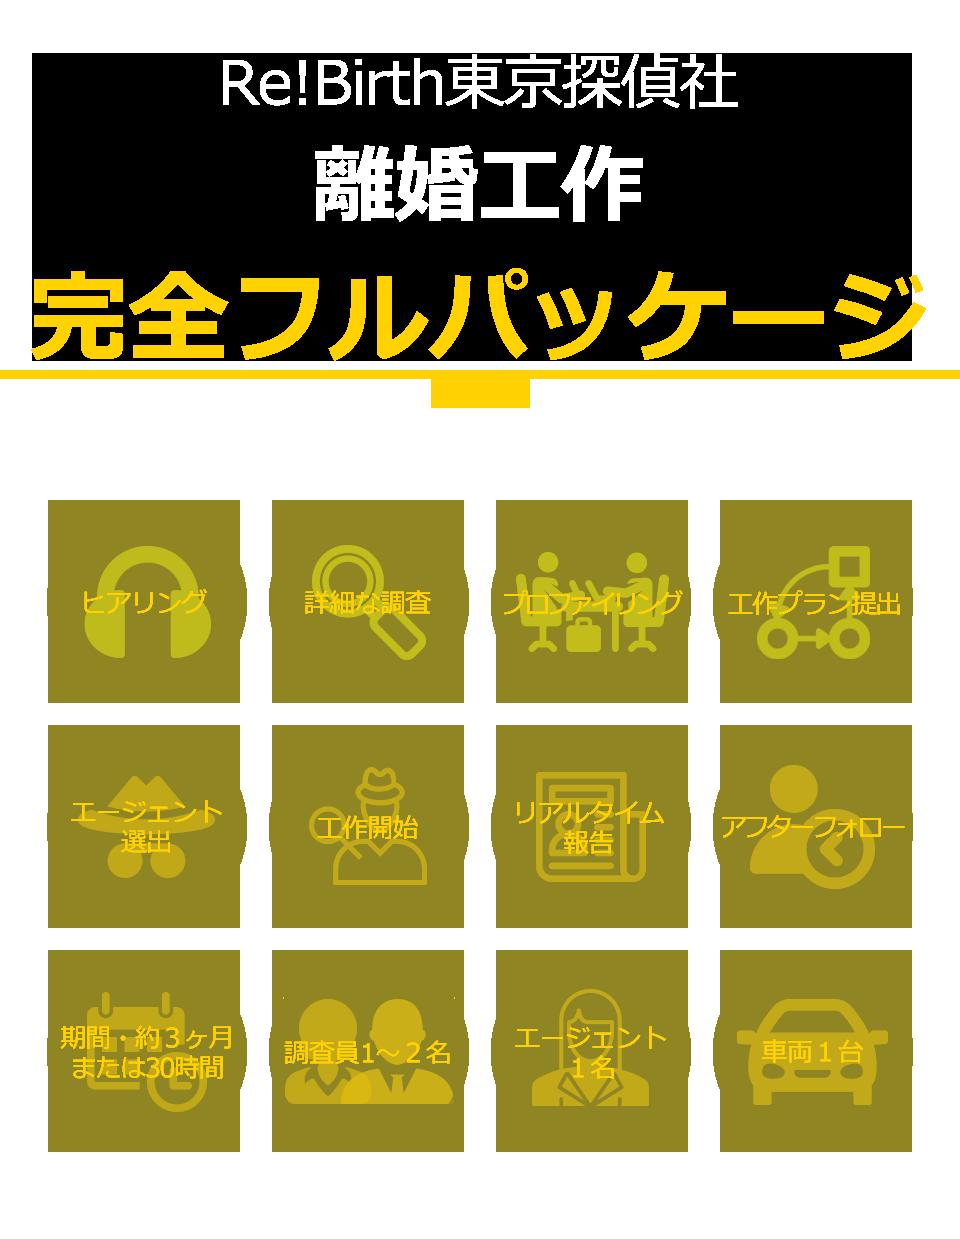 Re!Birth東京探偵社 離婚工作/完全フルパッケージ ヒアリング ・詳細な調査 ・プロファイリング ・工作プラン提出 ・エージェント選出 ・工作開始 ・リアルタイム報告 ・アフターフォロー ・期間・約3ヶ月または30時間 ・調査員1〜2名 ・エージェント1名 ・車両1台